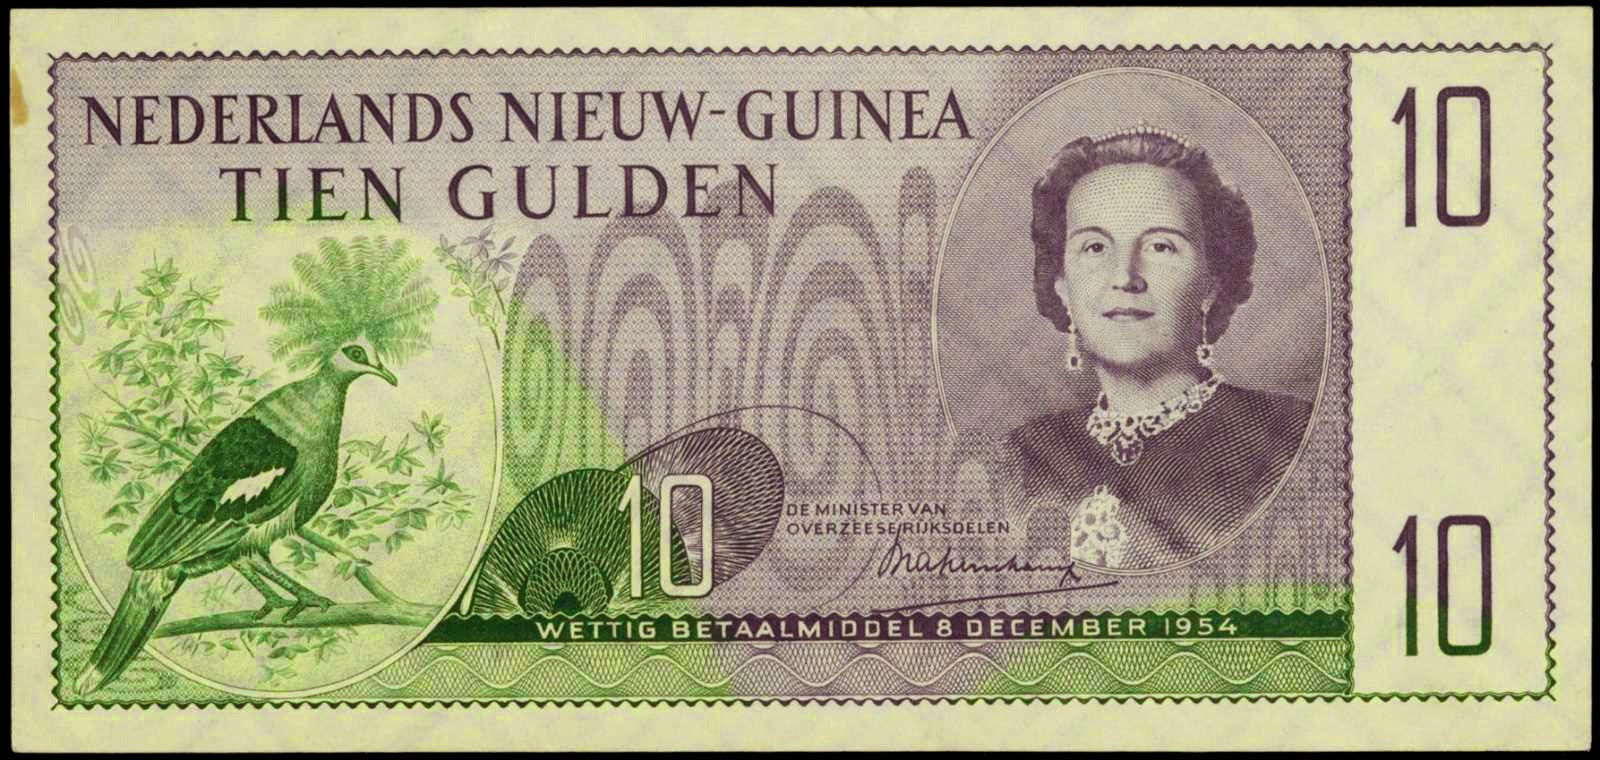 Netherlands New Guinea banknotes 10 Gulden bank note 1954 Queen Juliana